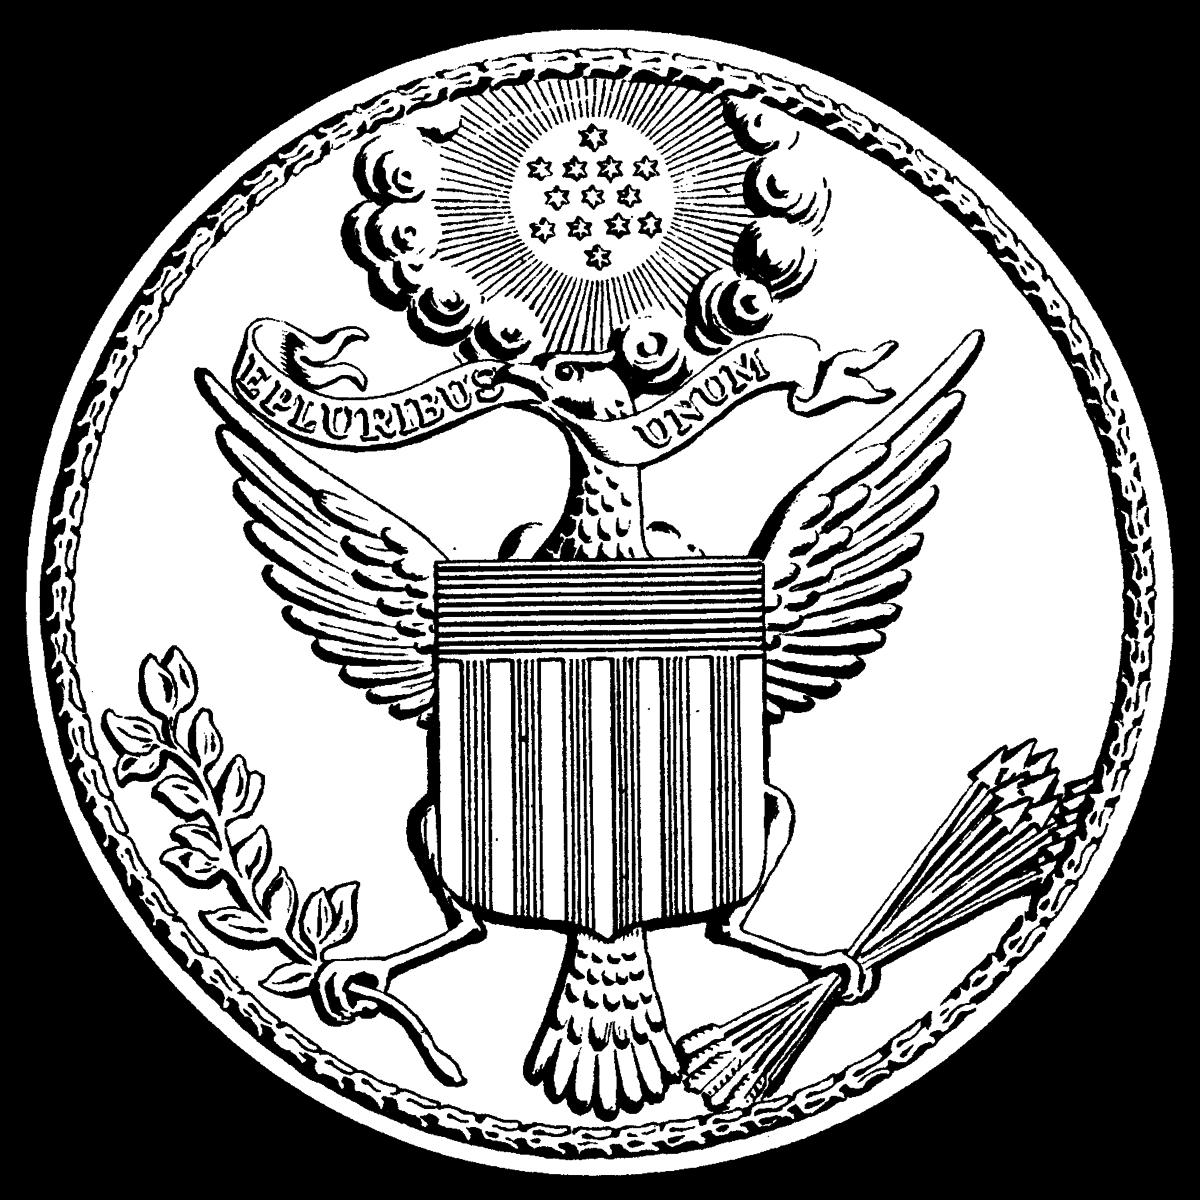 1200x1200 Pennsylvania In The American Civil War